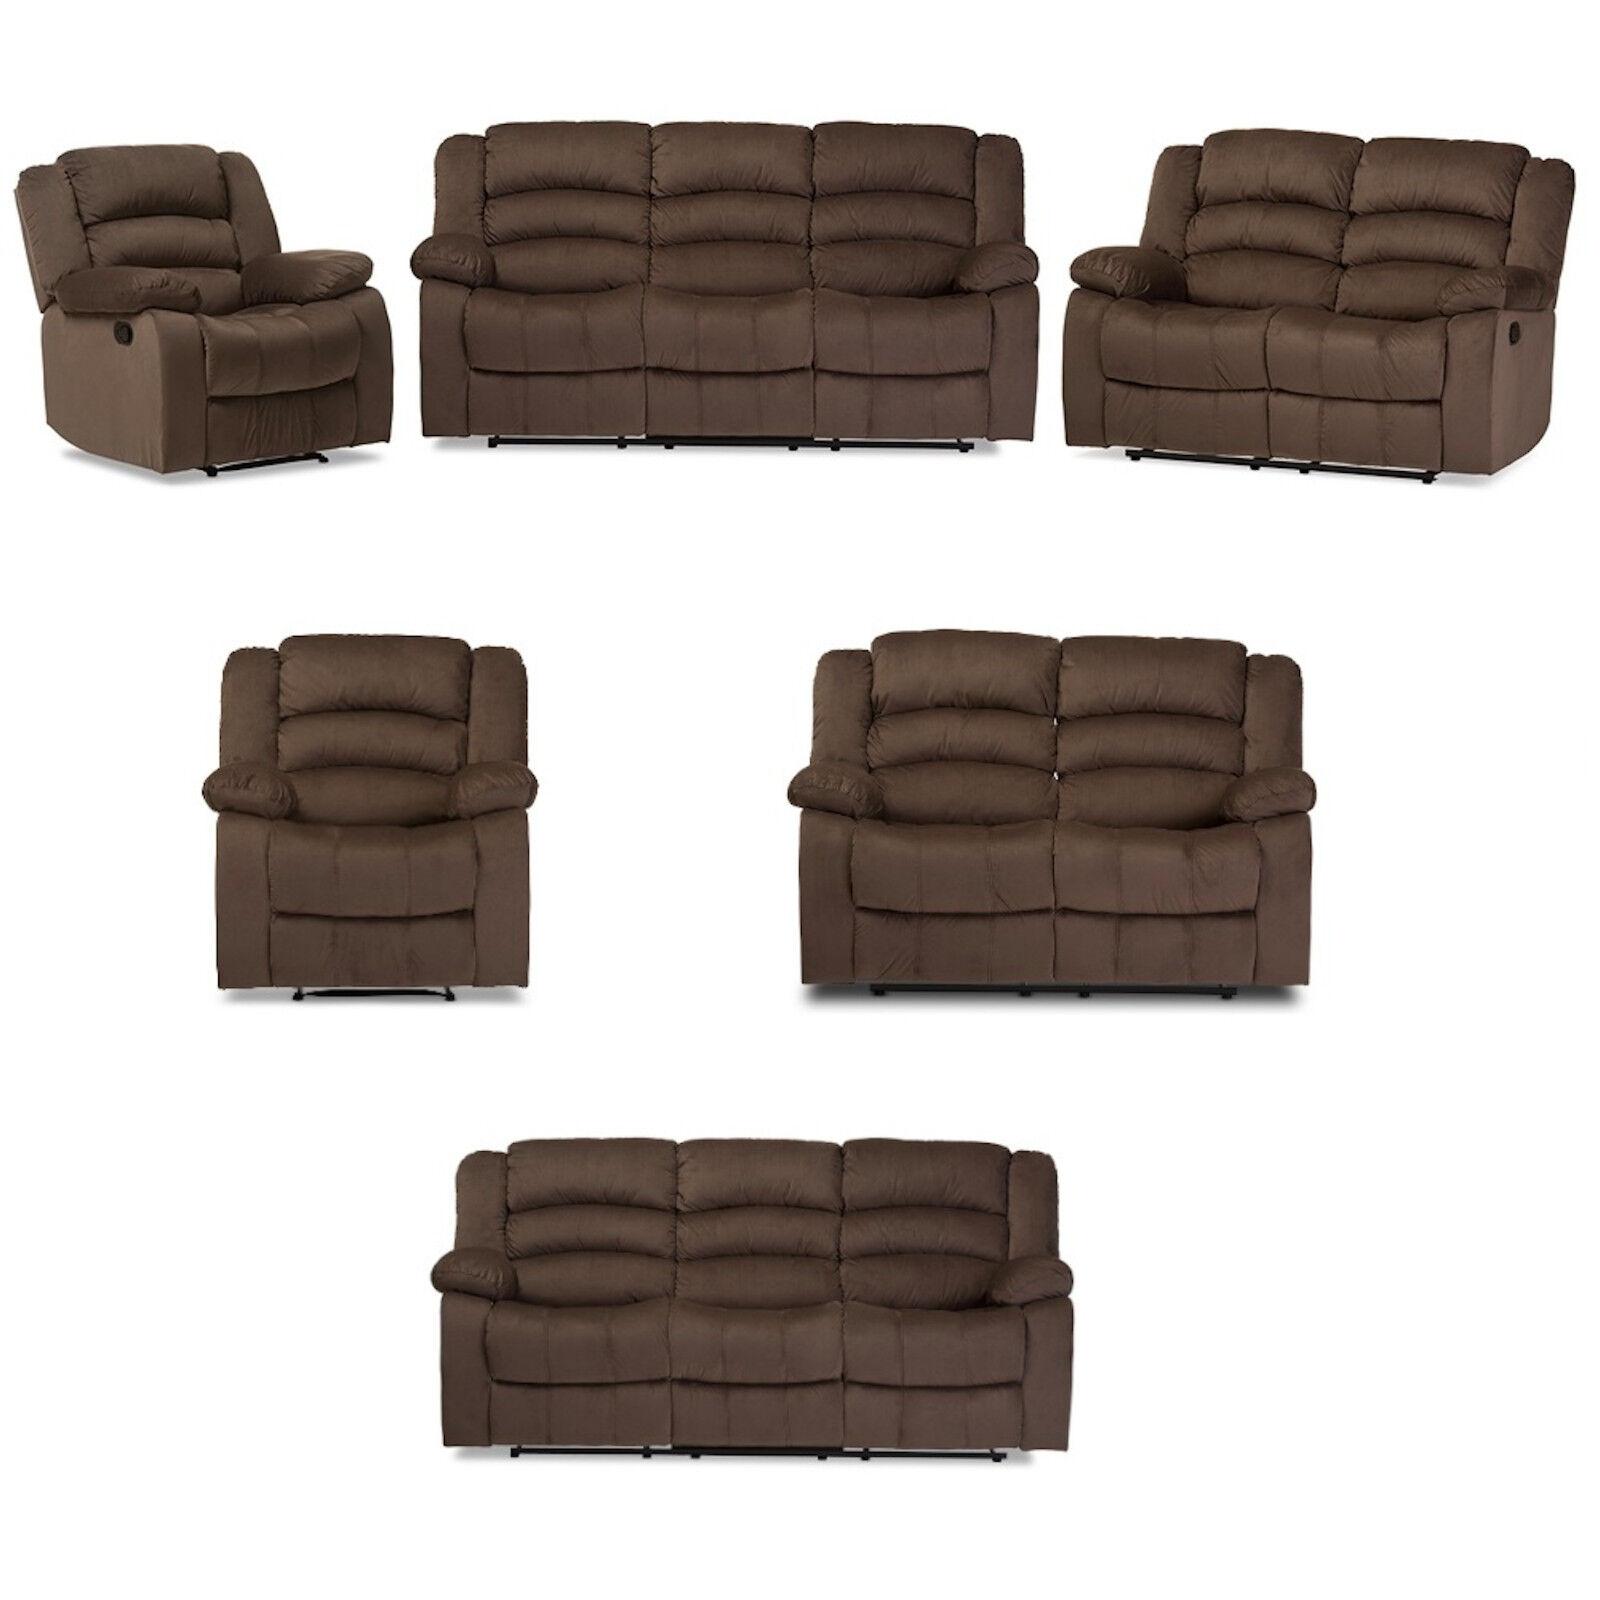 Microsuede Set 3-Seat Reclining Sofa, 2-Seat Loveseat, 1 Cha